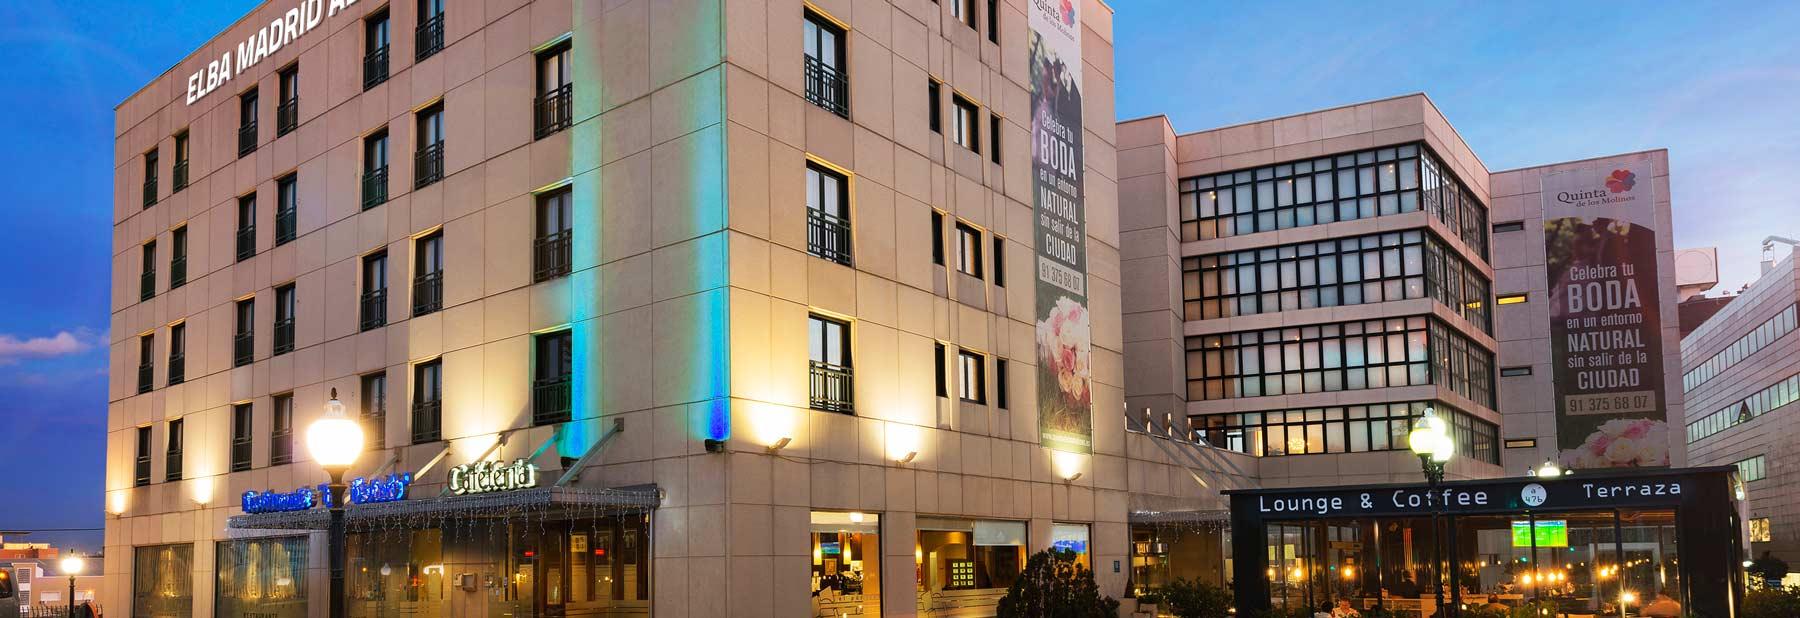 Madrid hoteles elba for Hoteles especiales madrid